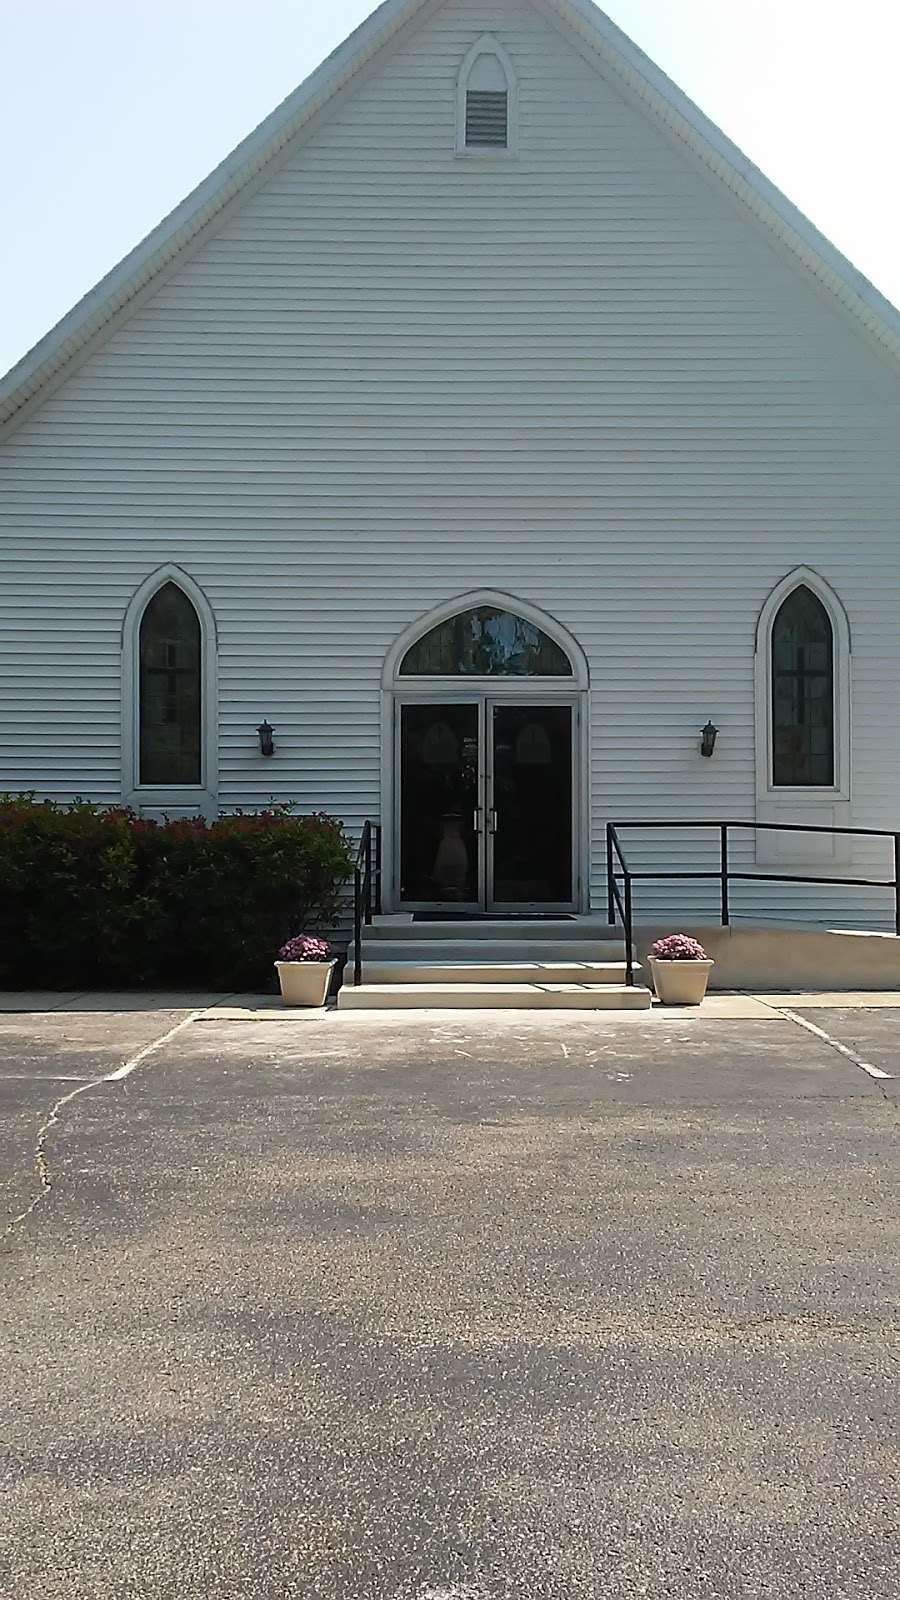 Huntsville Good Shepherd Church - church  | Photo 2 of 4 | Address: 3126 Market St, Pendleton, IN 46064, USA | Phone: (765) 778-2993